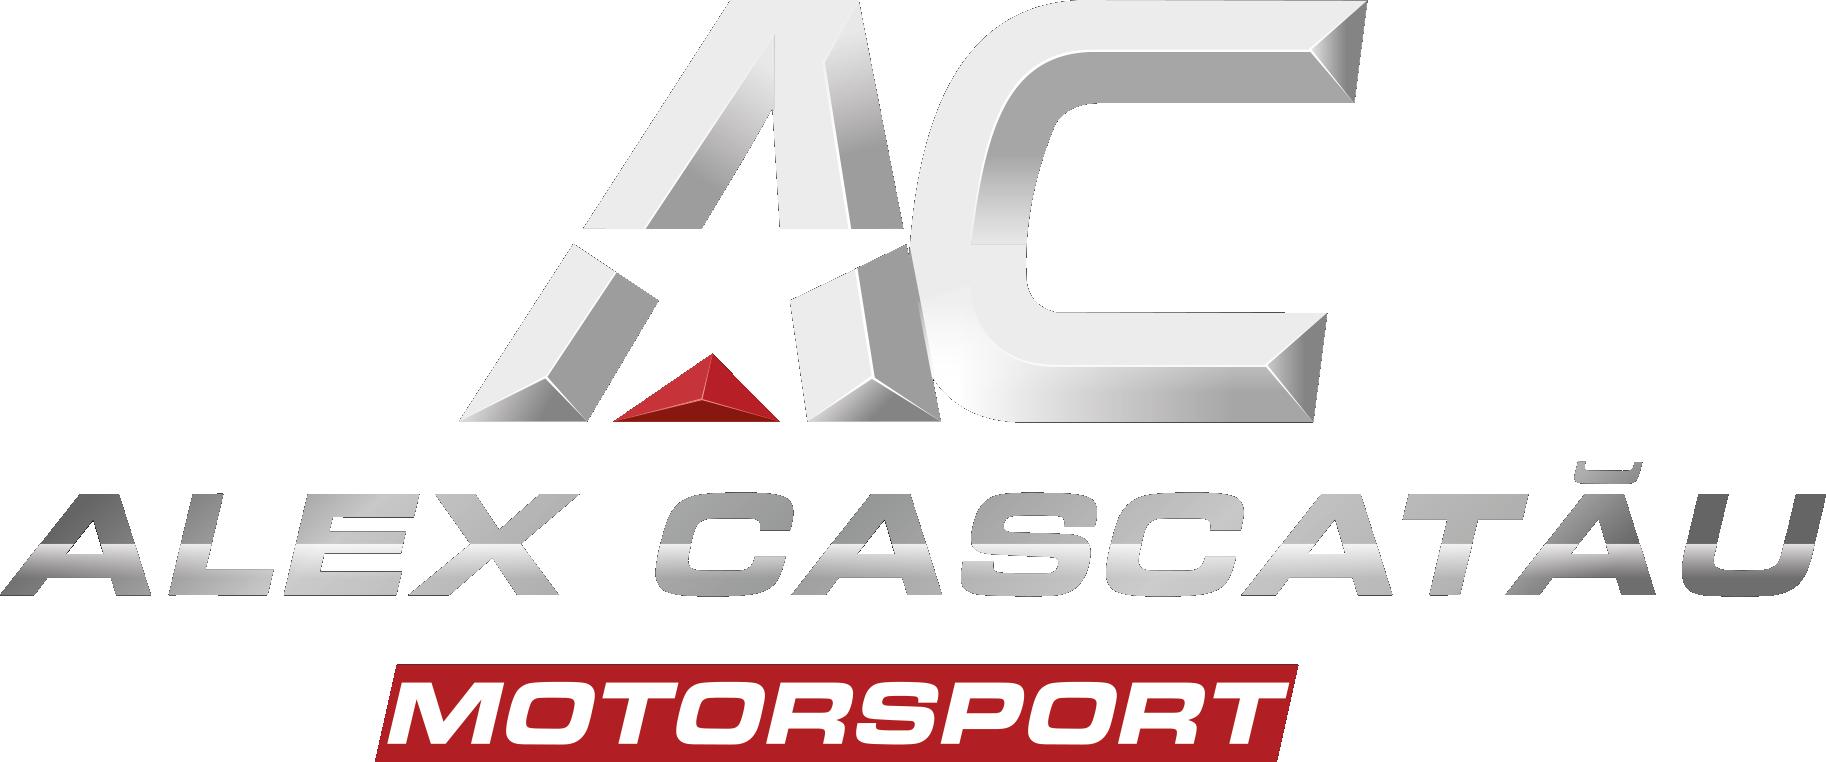 Asociatia Club Sportiv Alex Cascatau Motorsport logo